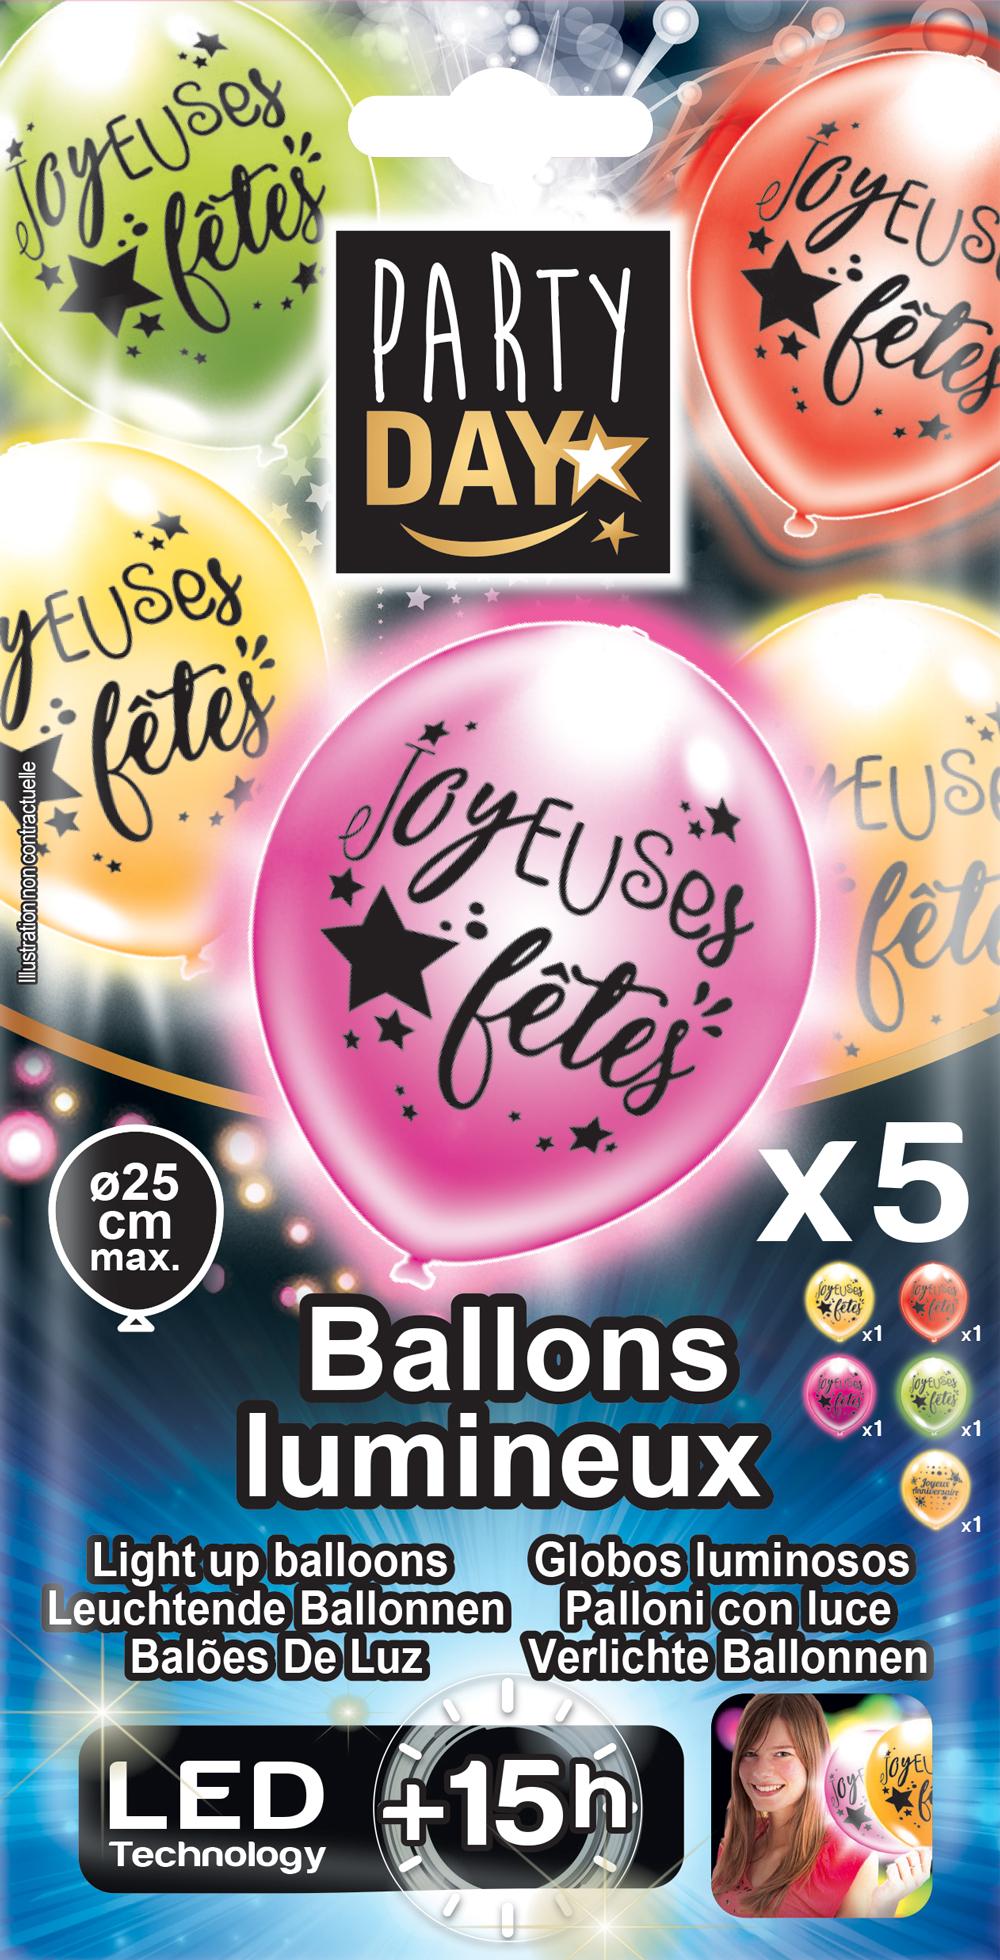 P155951-BALLONS-LED-joyeuses-fetes-3D_2018